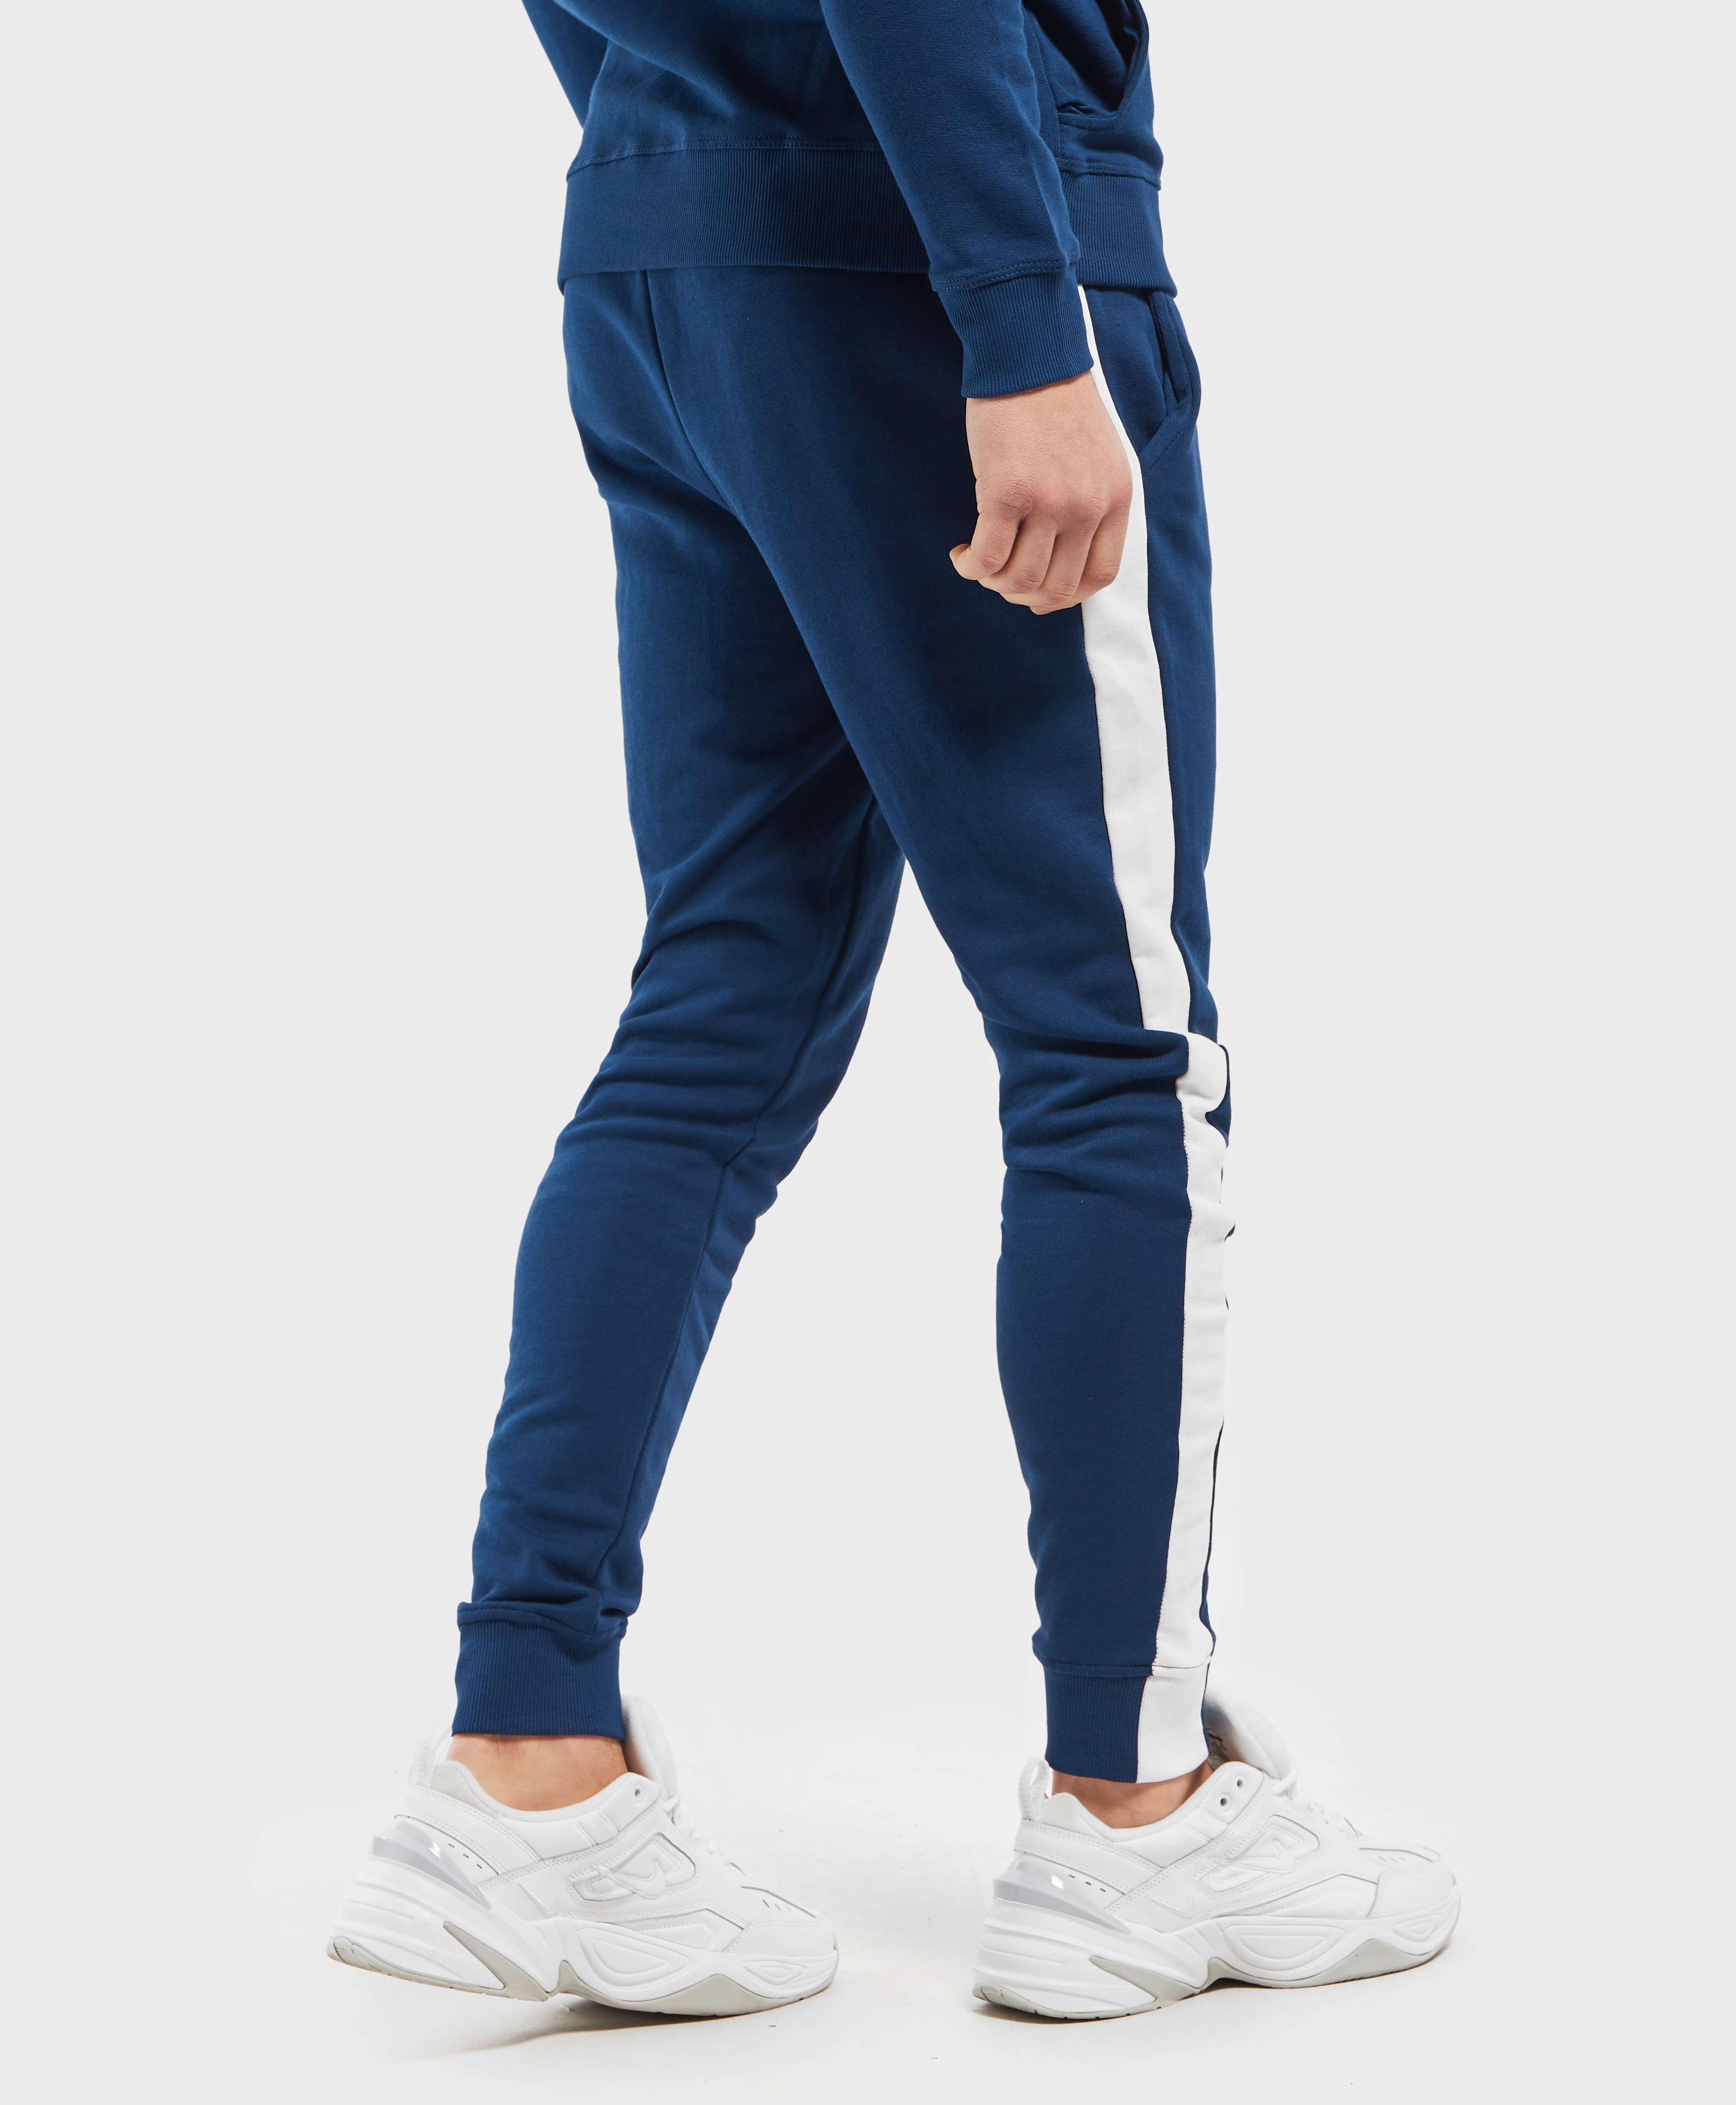 Guess Side Logo Cuffed Fleece Pants - Online Exclusive